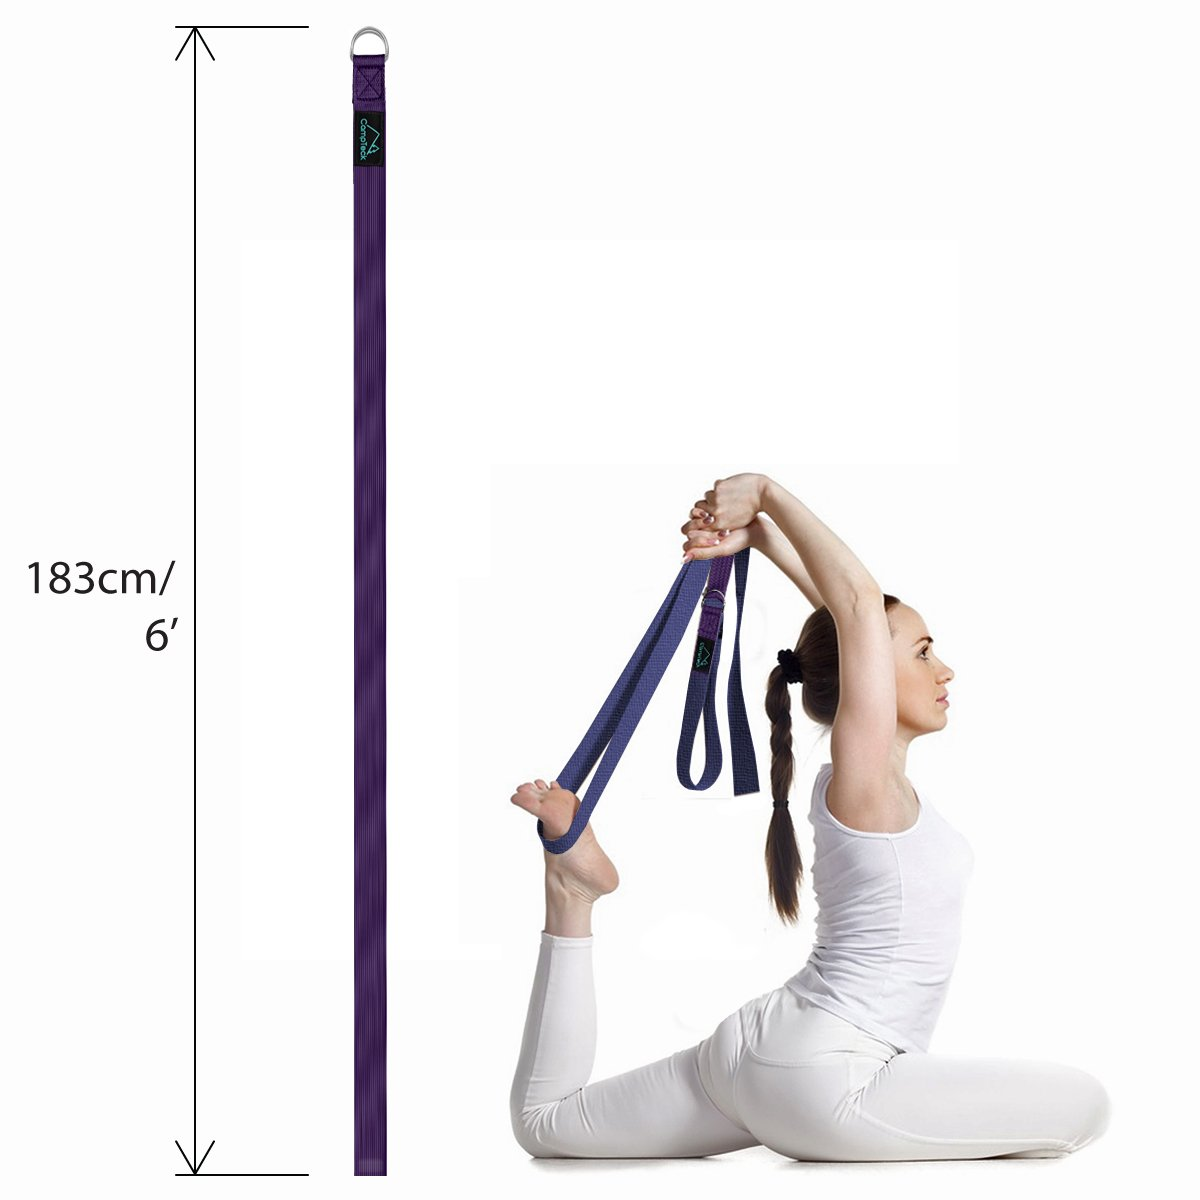 CampTeck Cinta Yoga Anillo D Poliéster Ajustable Yoga Strap de Estiramiento para Posturas, Flexibilidad, Alineación, Resistencia para Pilates, Yoga, ...